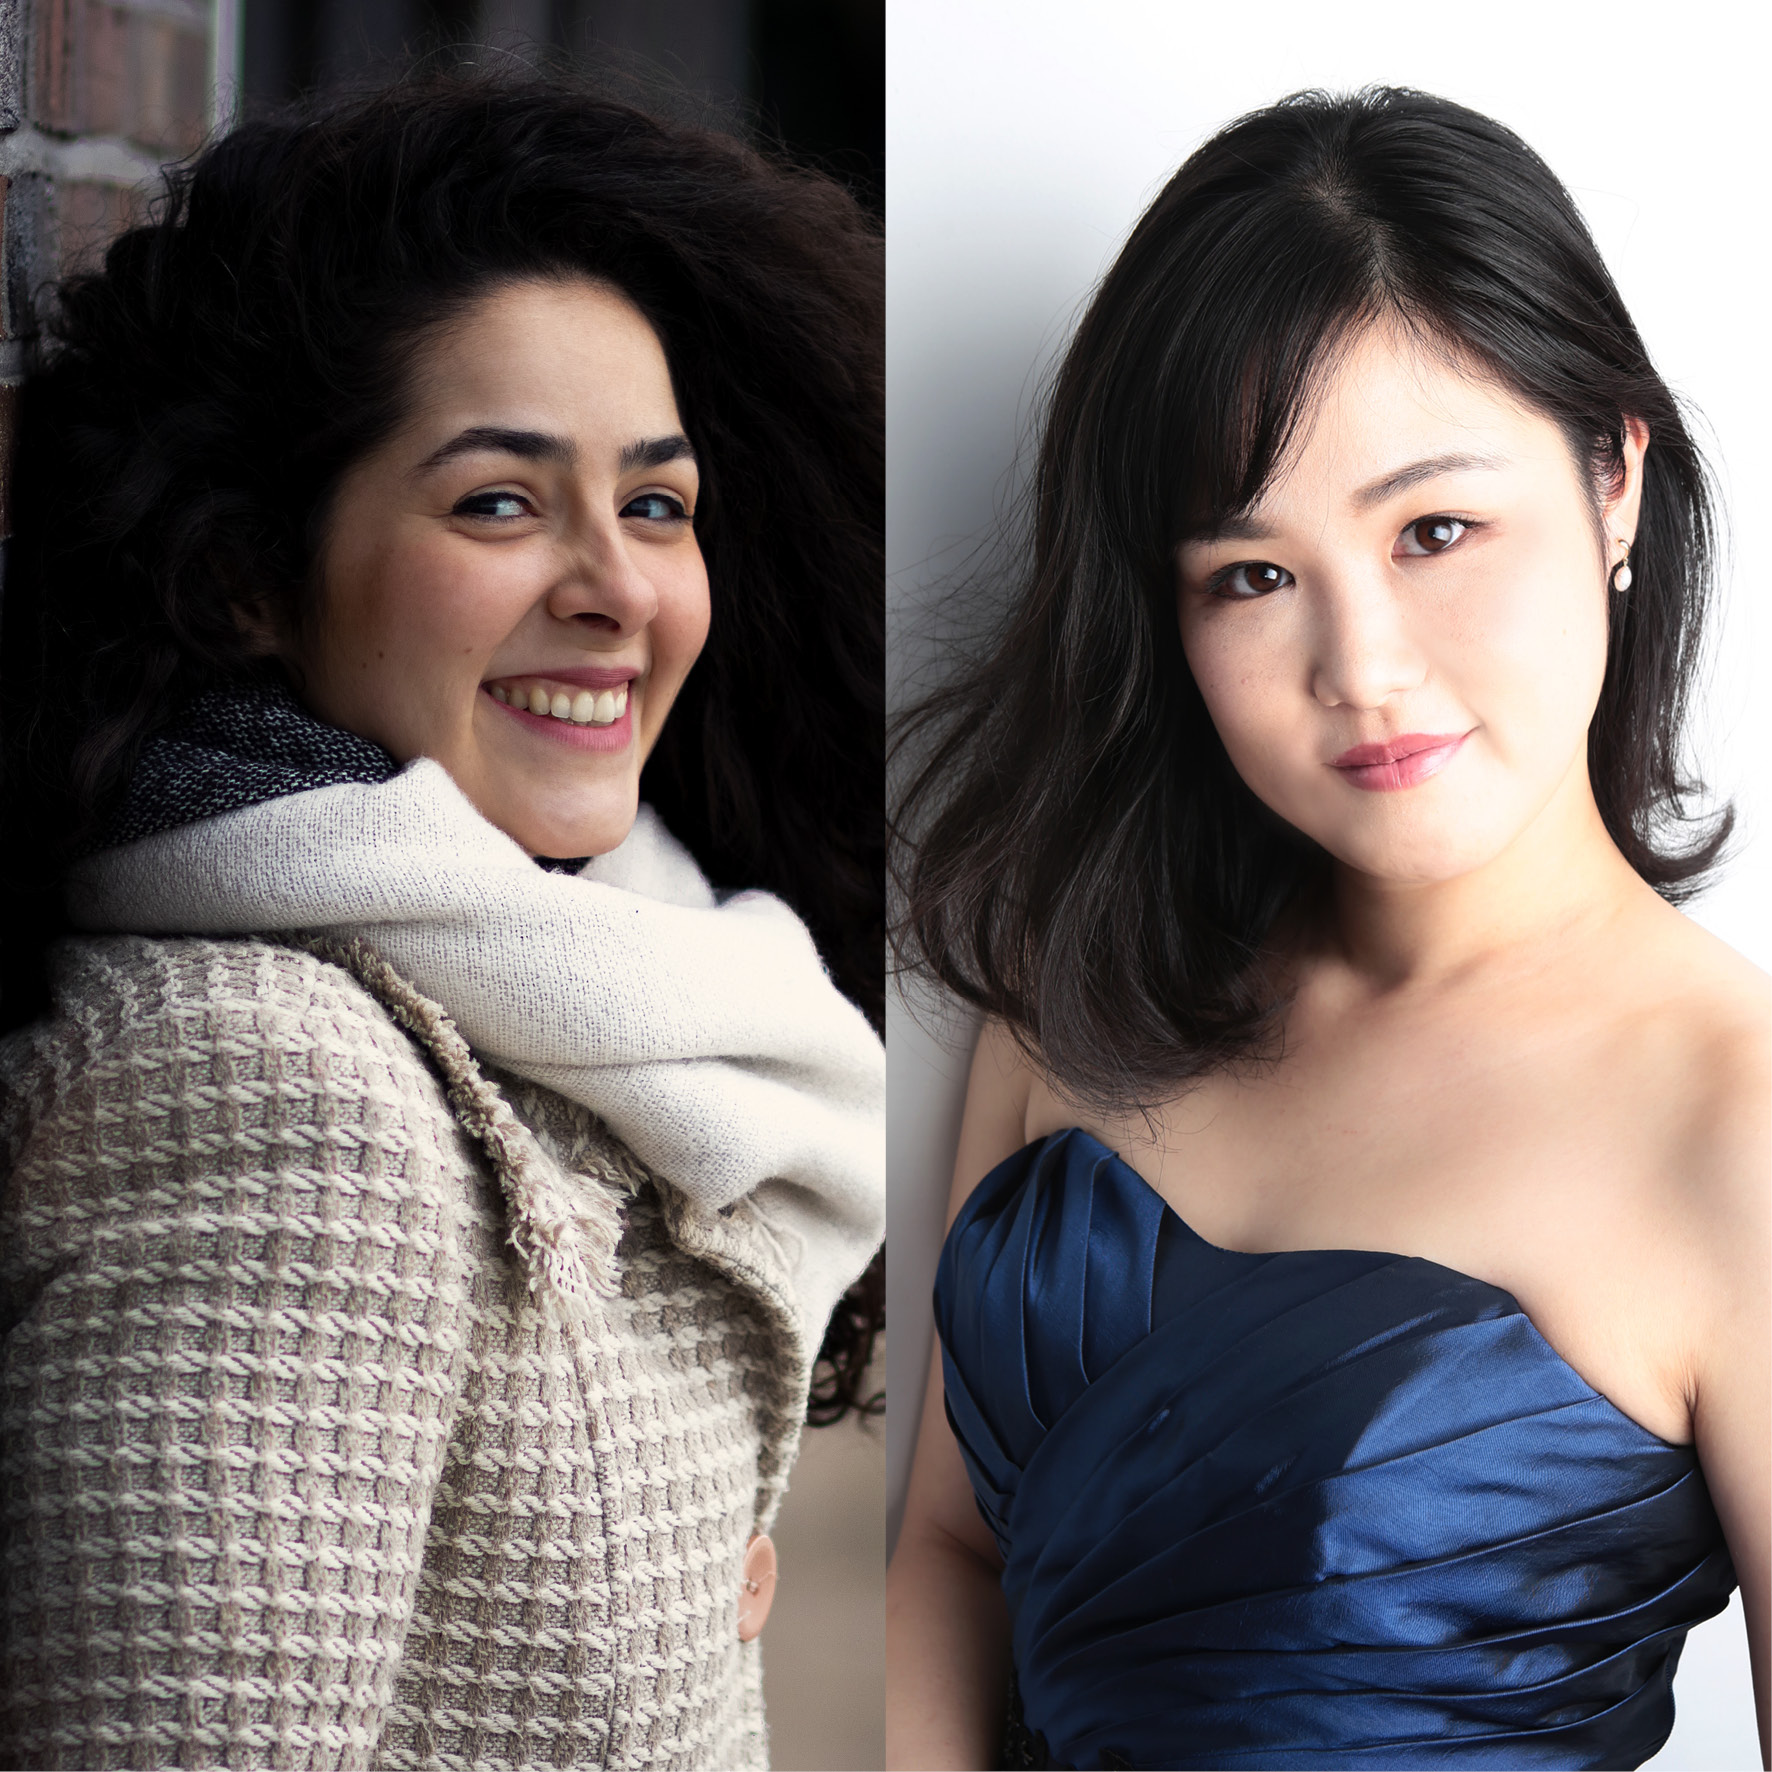 Duo 8: Ana Carolina Coutinho / Megumi Kuroda